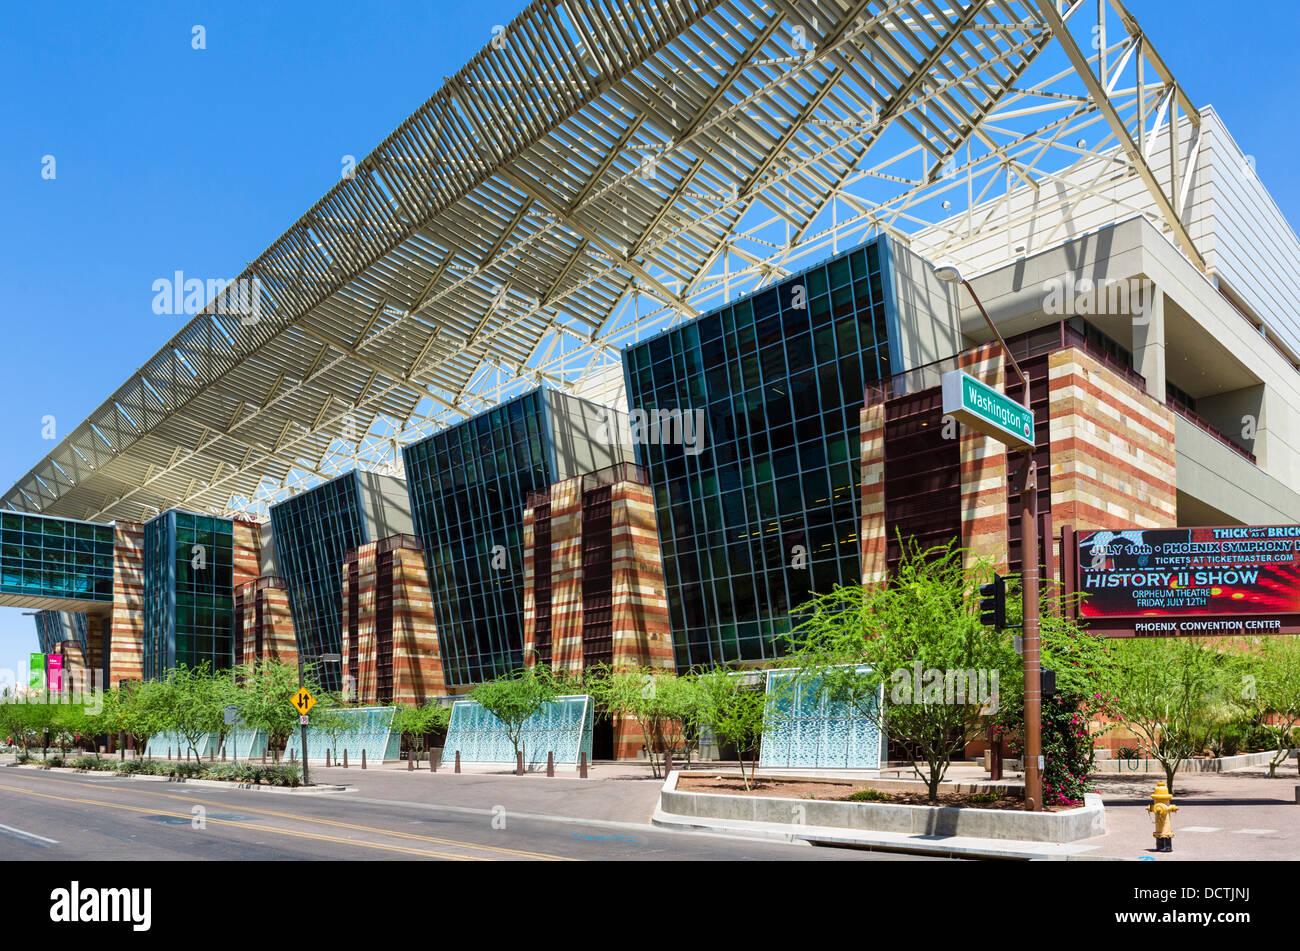 Phoenix Convention Center On N 3rd St In Downtown Phoenix Arizona Stock Photo 59548542 Alamy